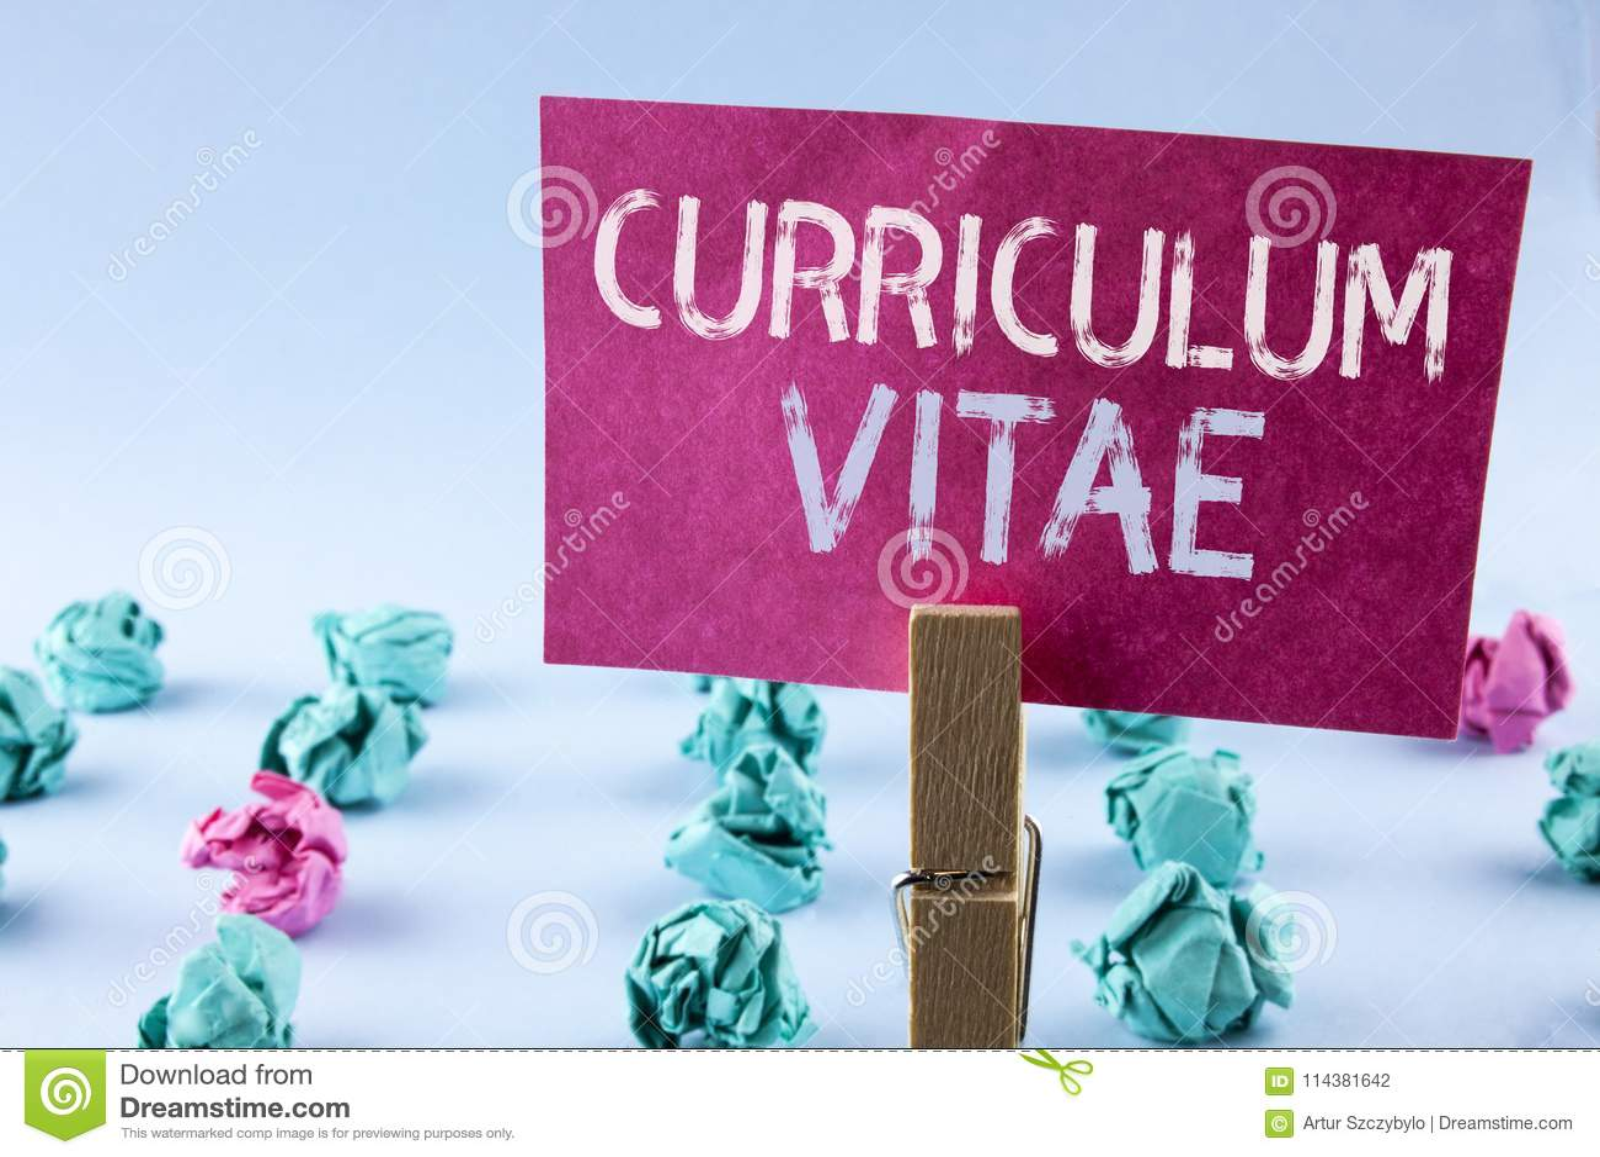 Curriculum Vitae Del Texto De La Escritura De La Palabra Concepto ...